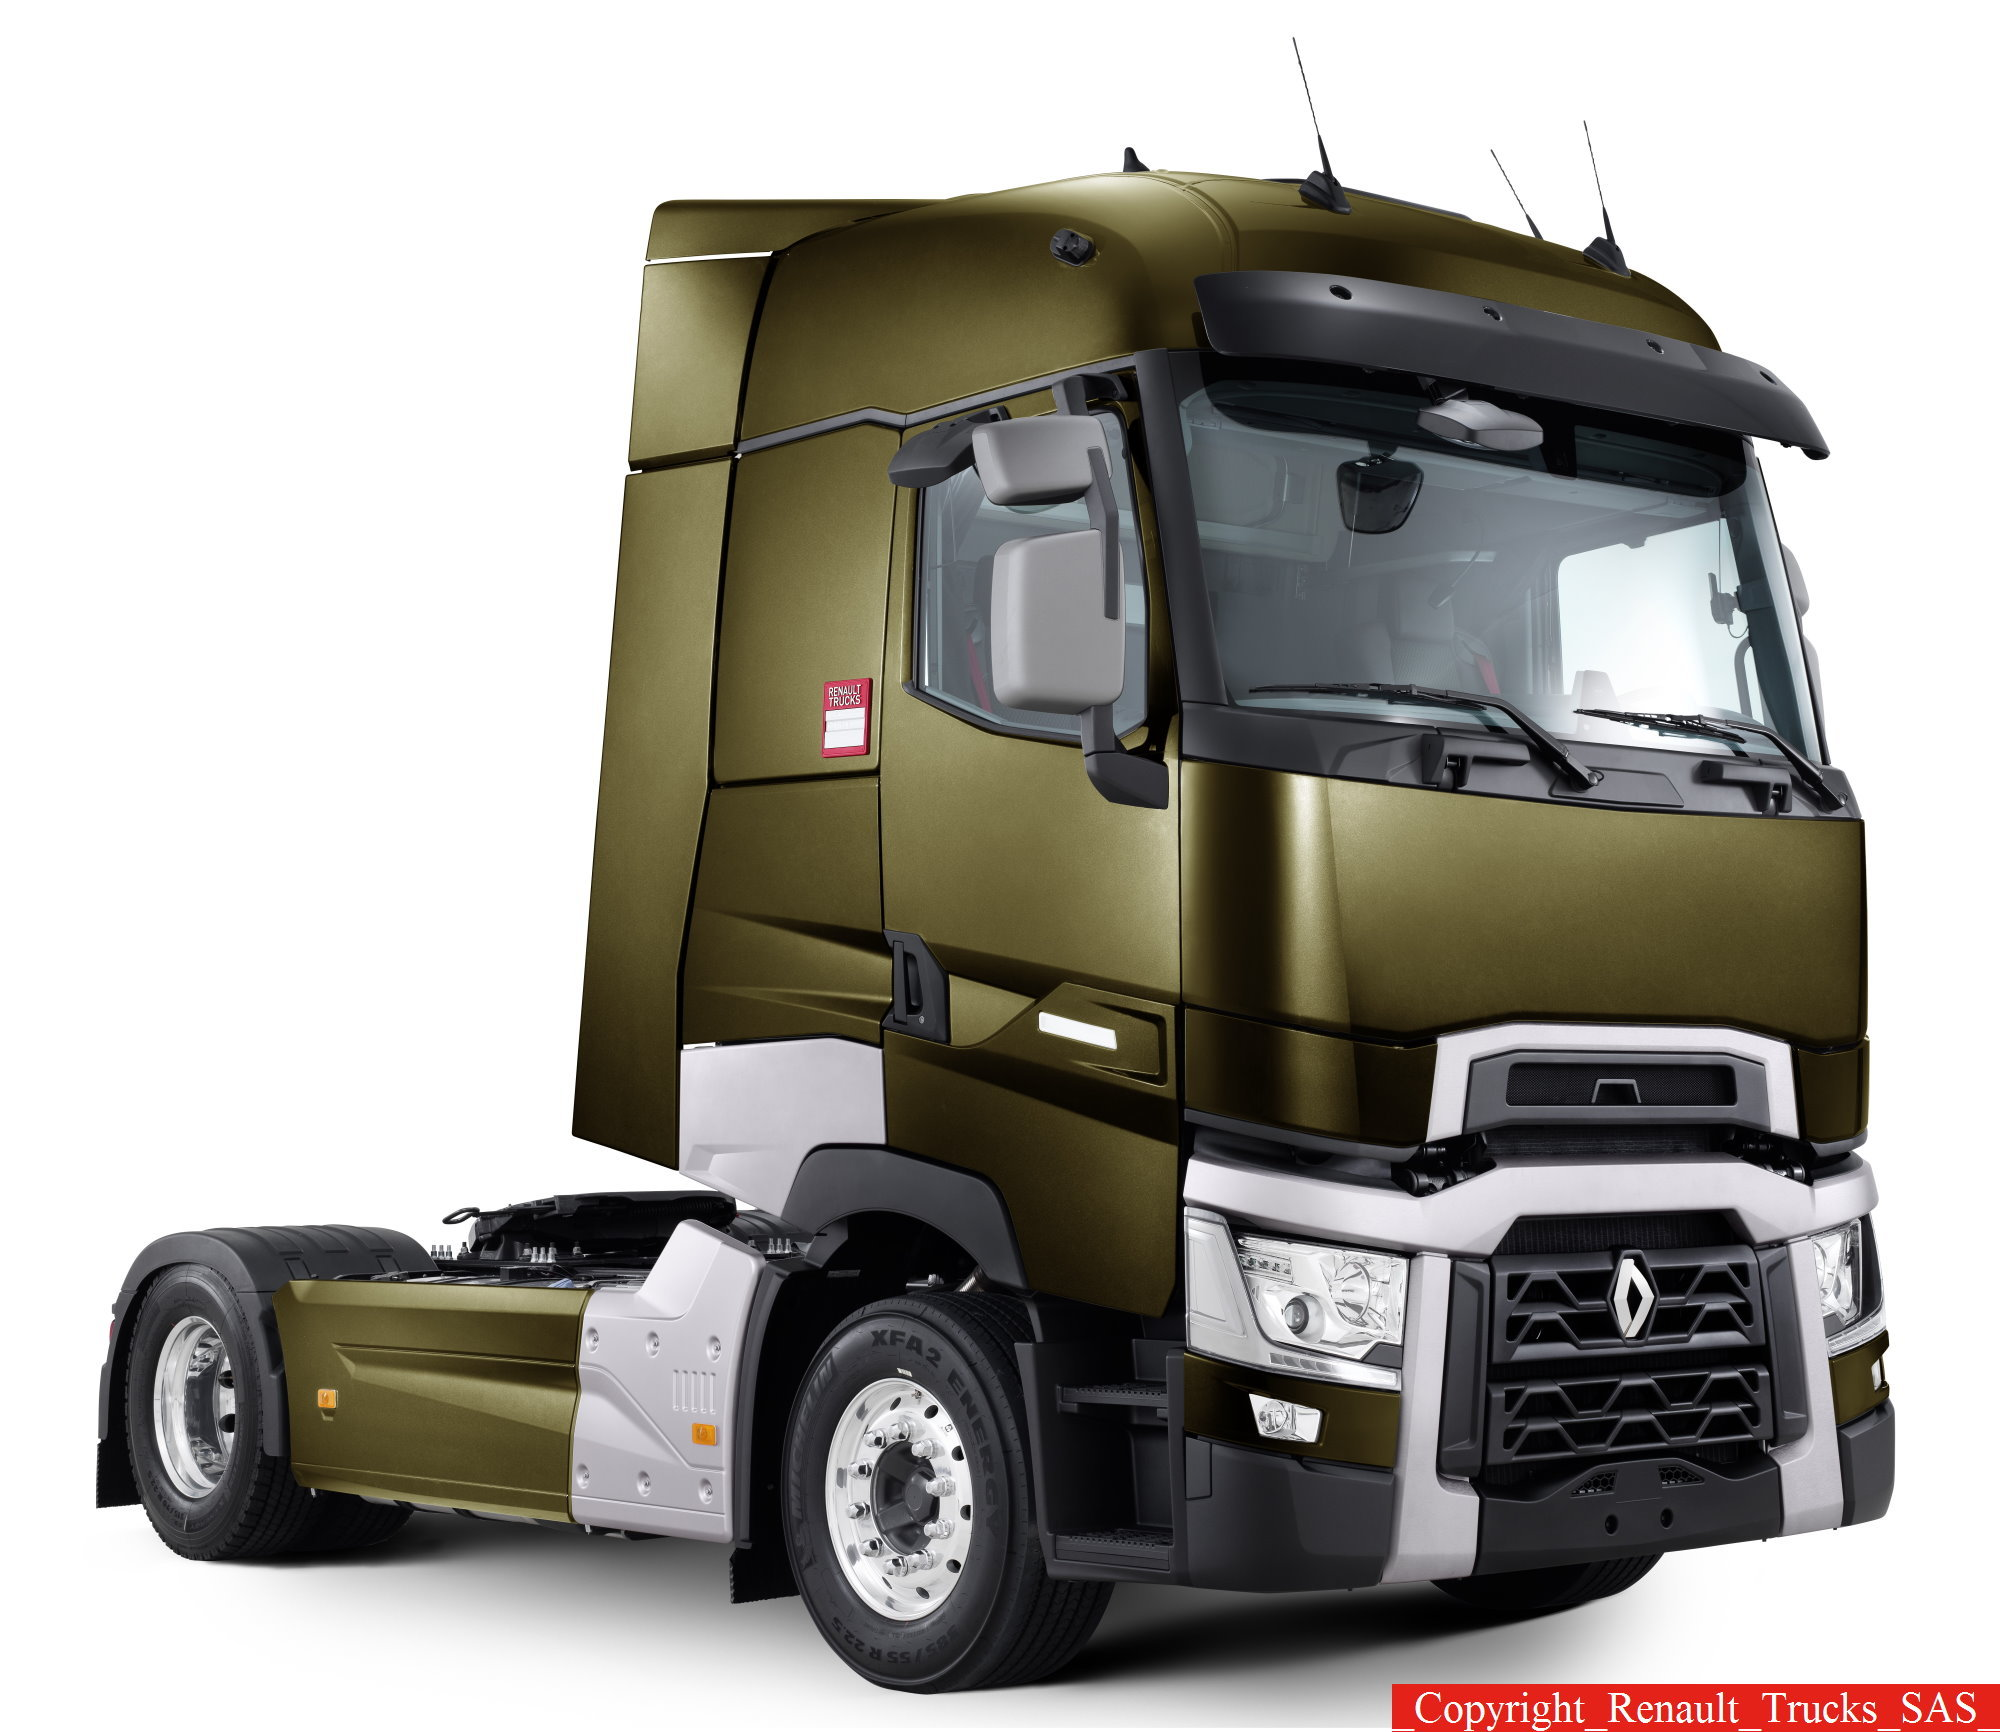 renault trucks a pr sent une nouvelle gamme. Black Bedroom Furniture Sets. Home Design Ideas